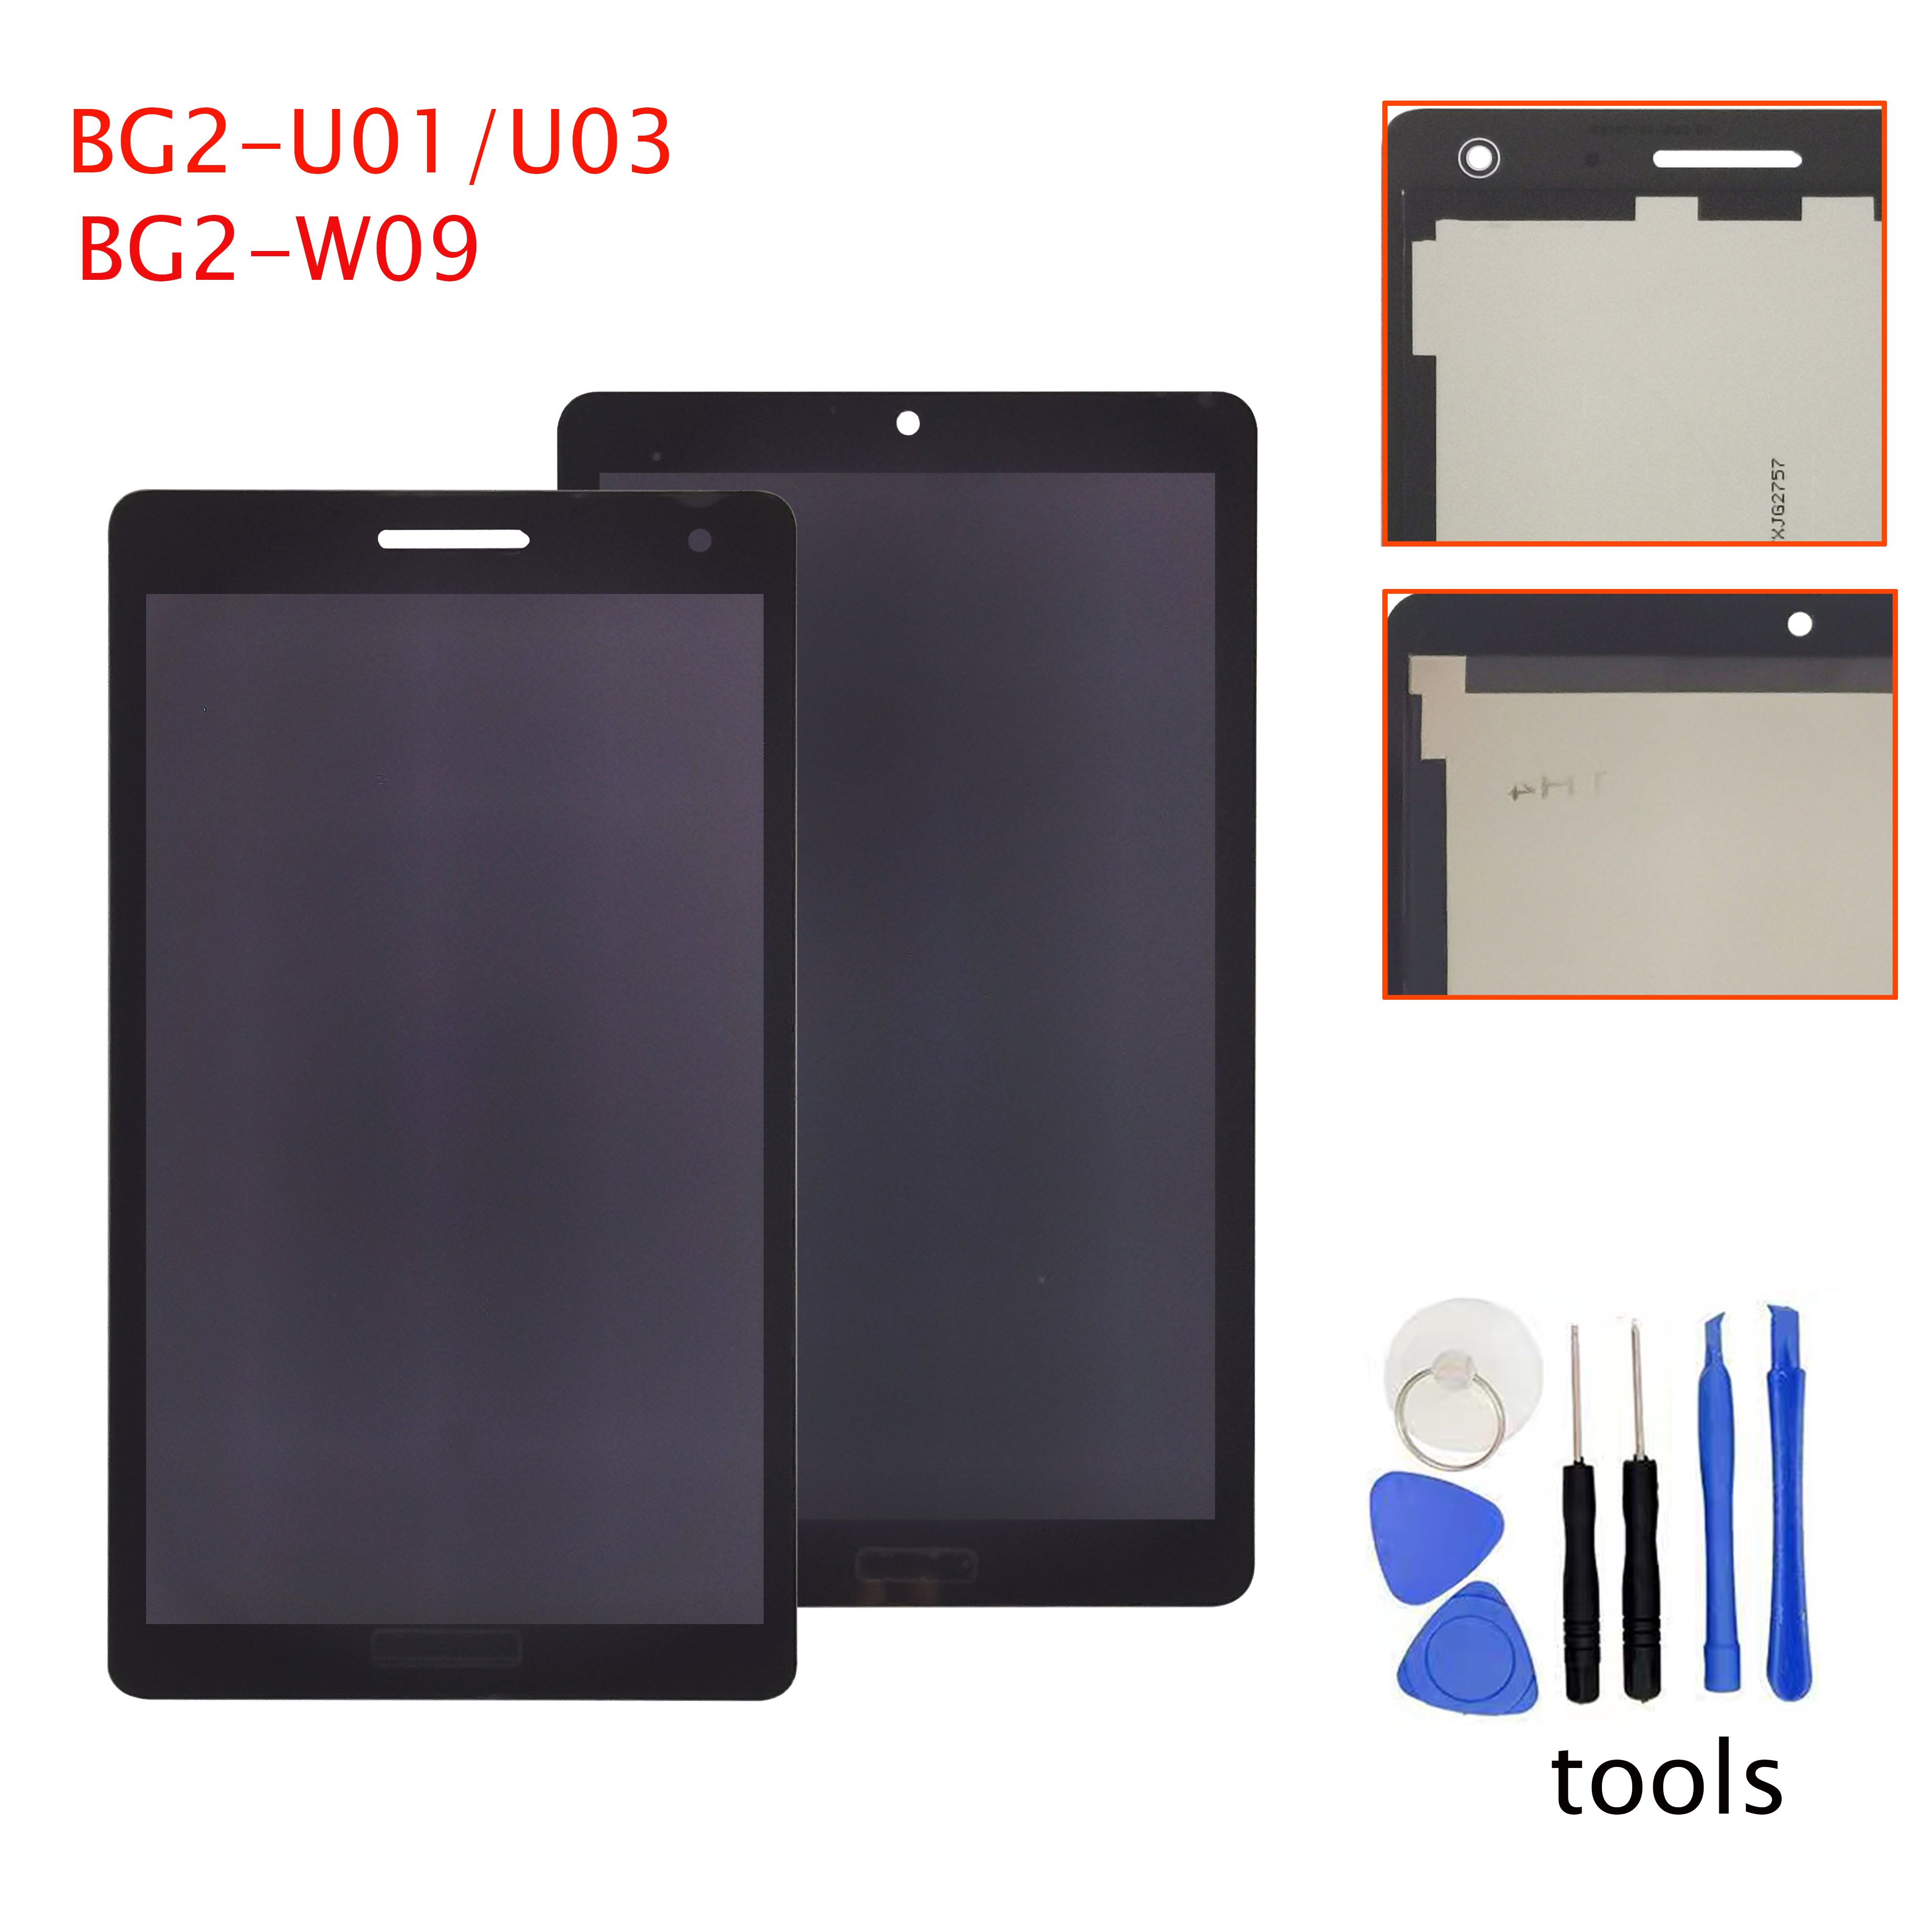 Для Huawei Mediapad T3 7,0 BG2-W09 BG2-U01 BG2-U03 TV070WSM-TH5 TV070WSM, ЖК-дисплей, сенсорный экран, дигитайзер, для сборки